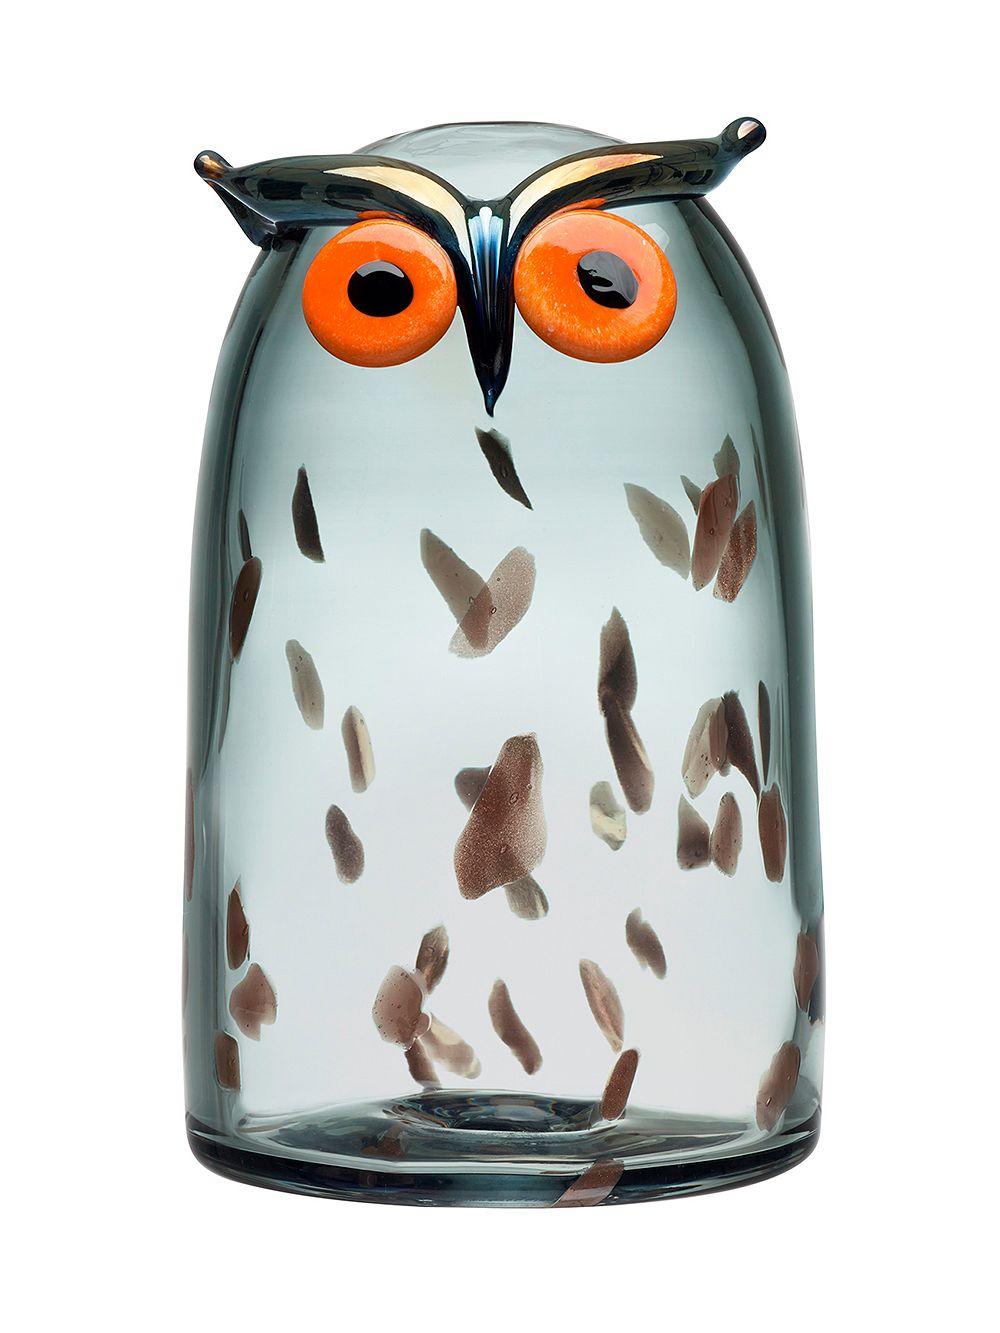 Iittala's Birds by Toikka Long-eared Owl glass bird